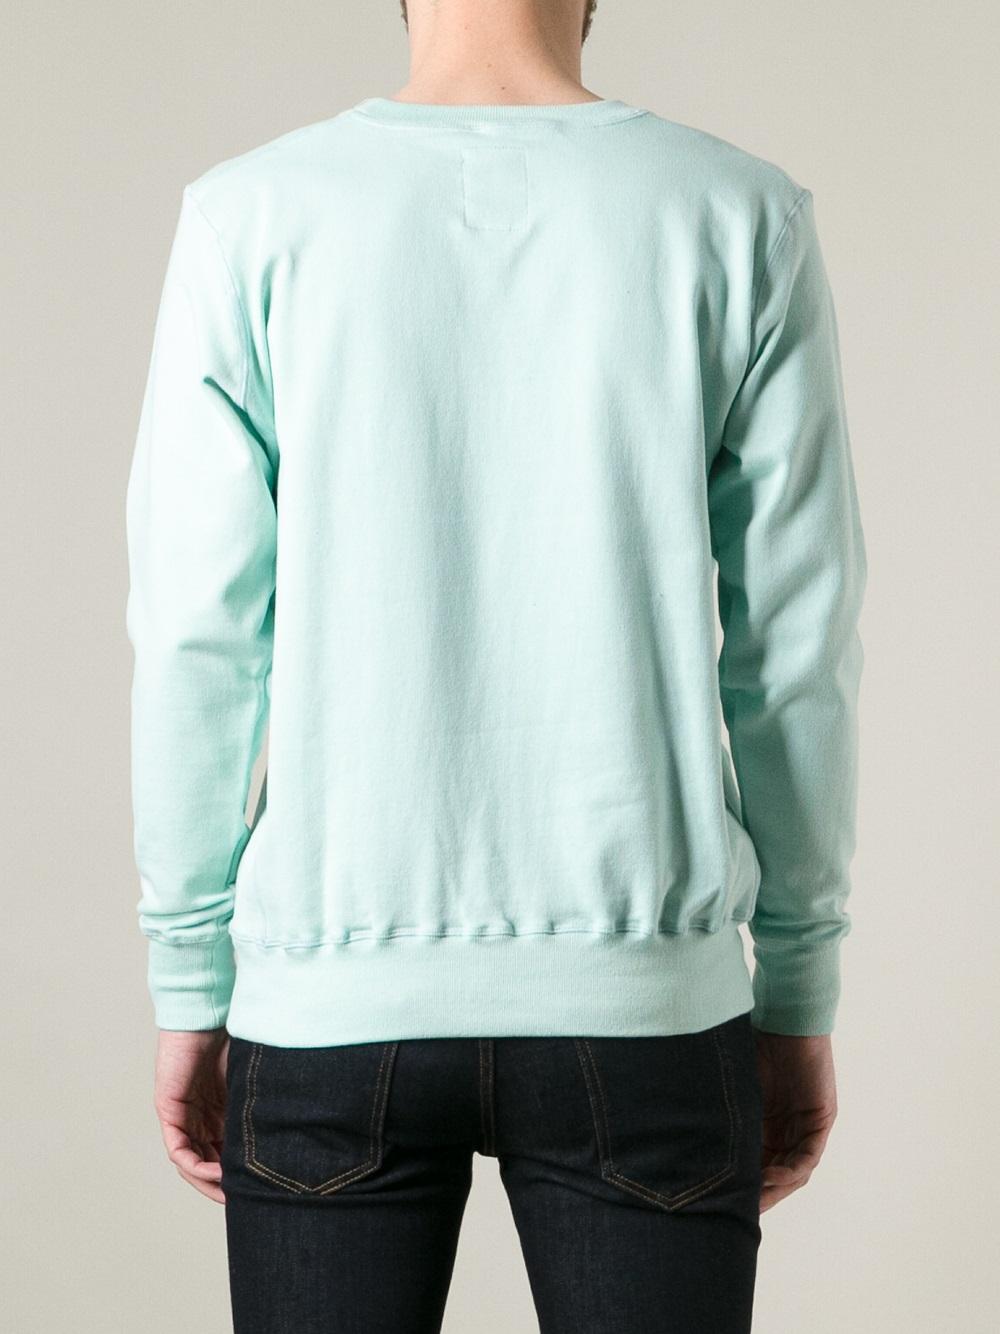 Bleu de Paname Sweatshirt 4